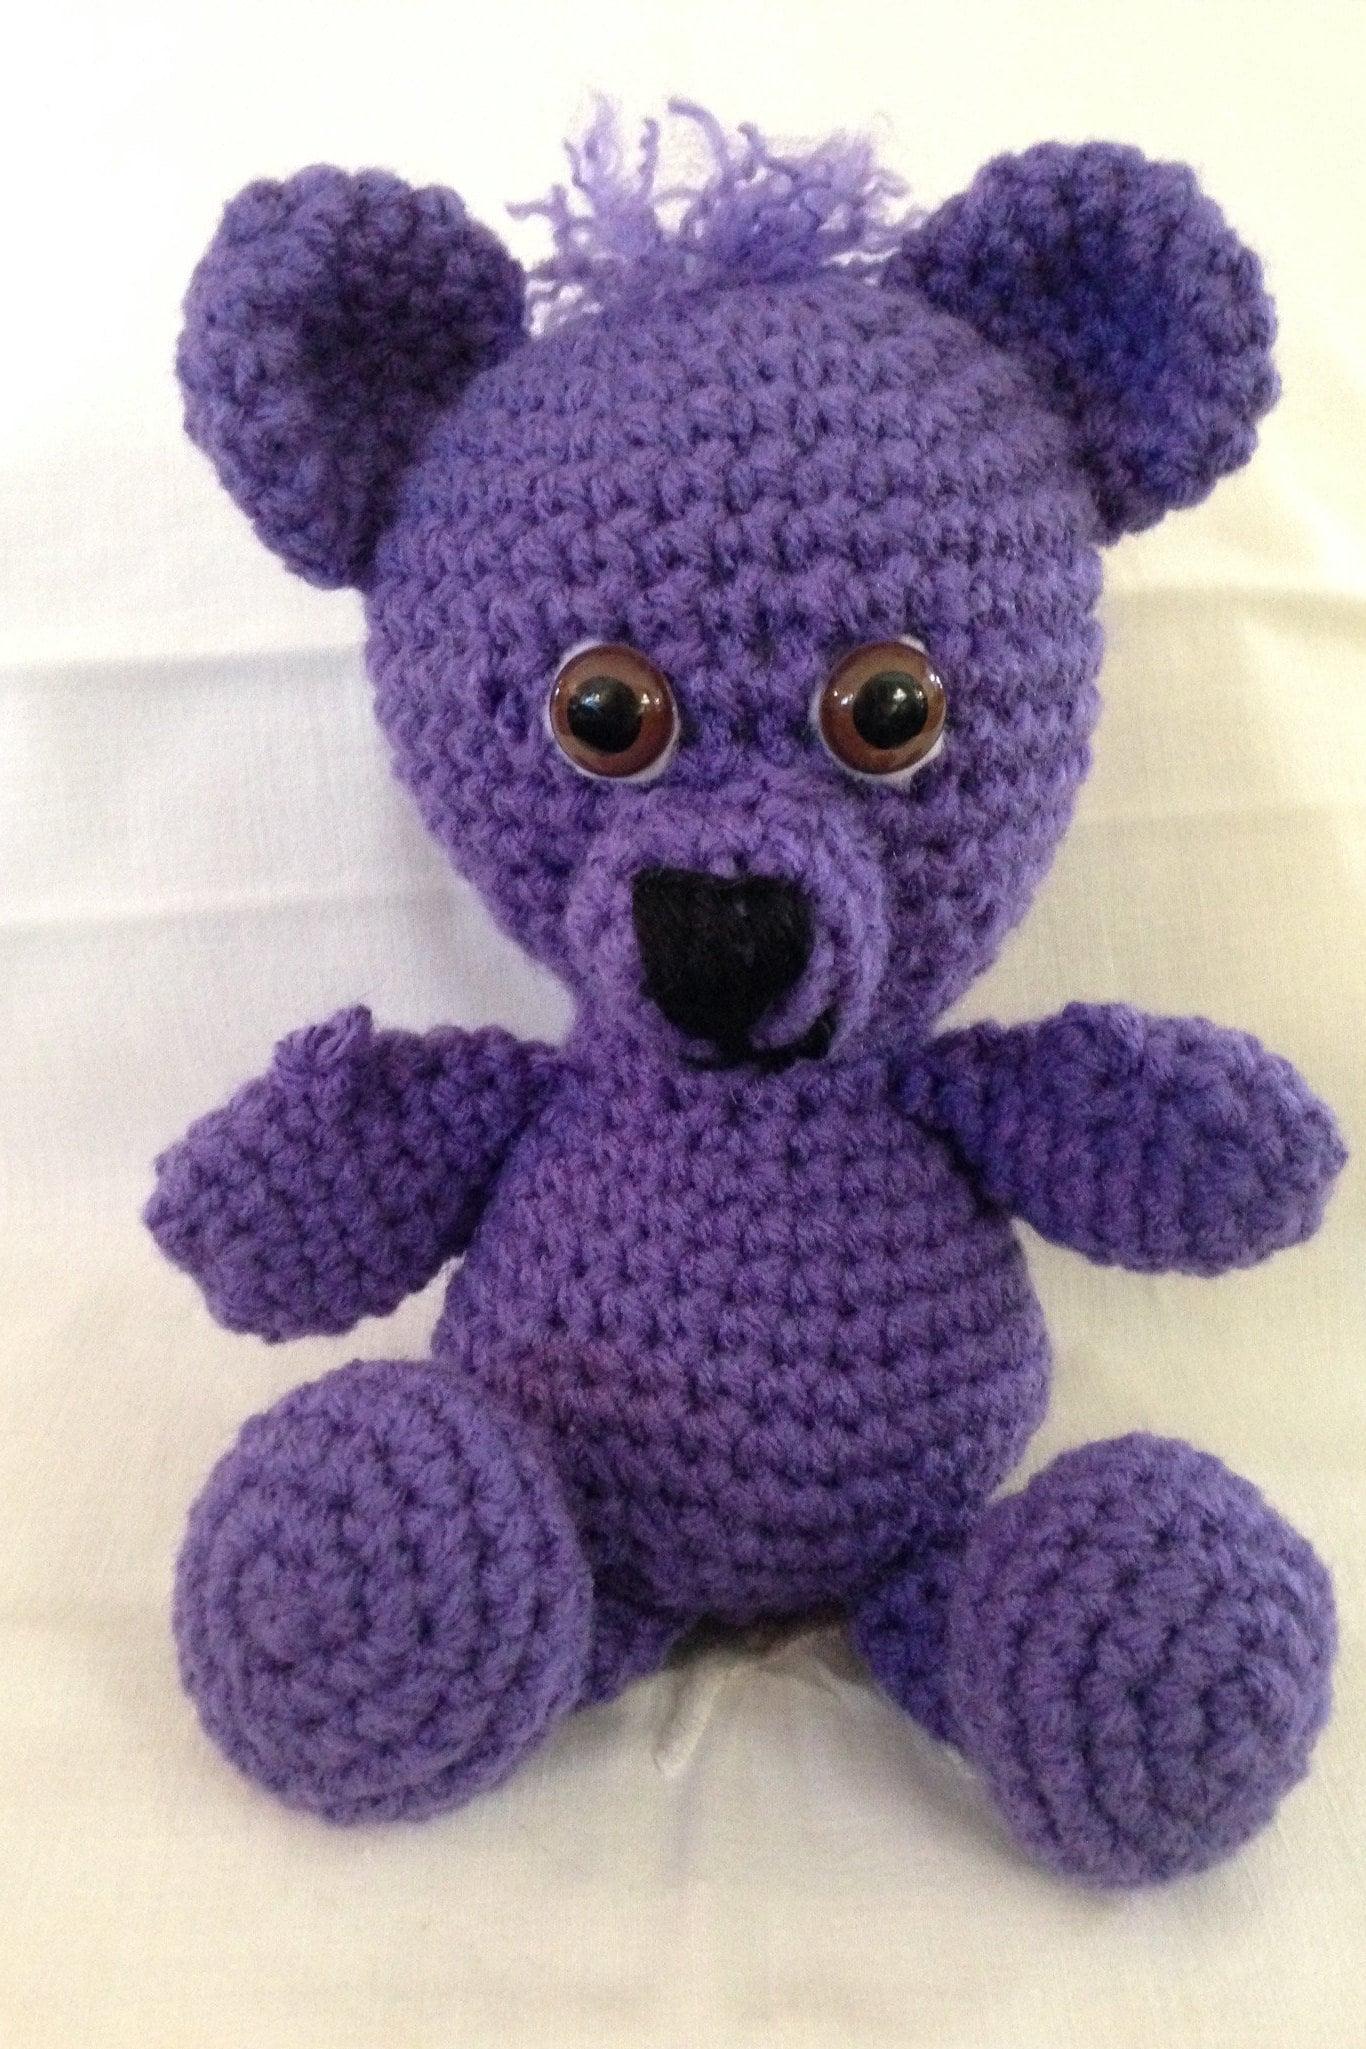 15 Crochet Teddy Bear Patterns | 2049x1366